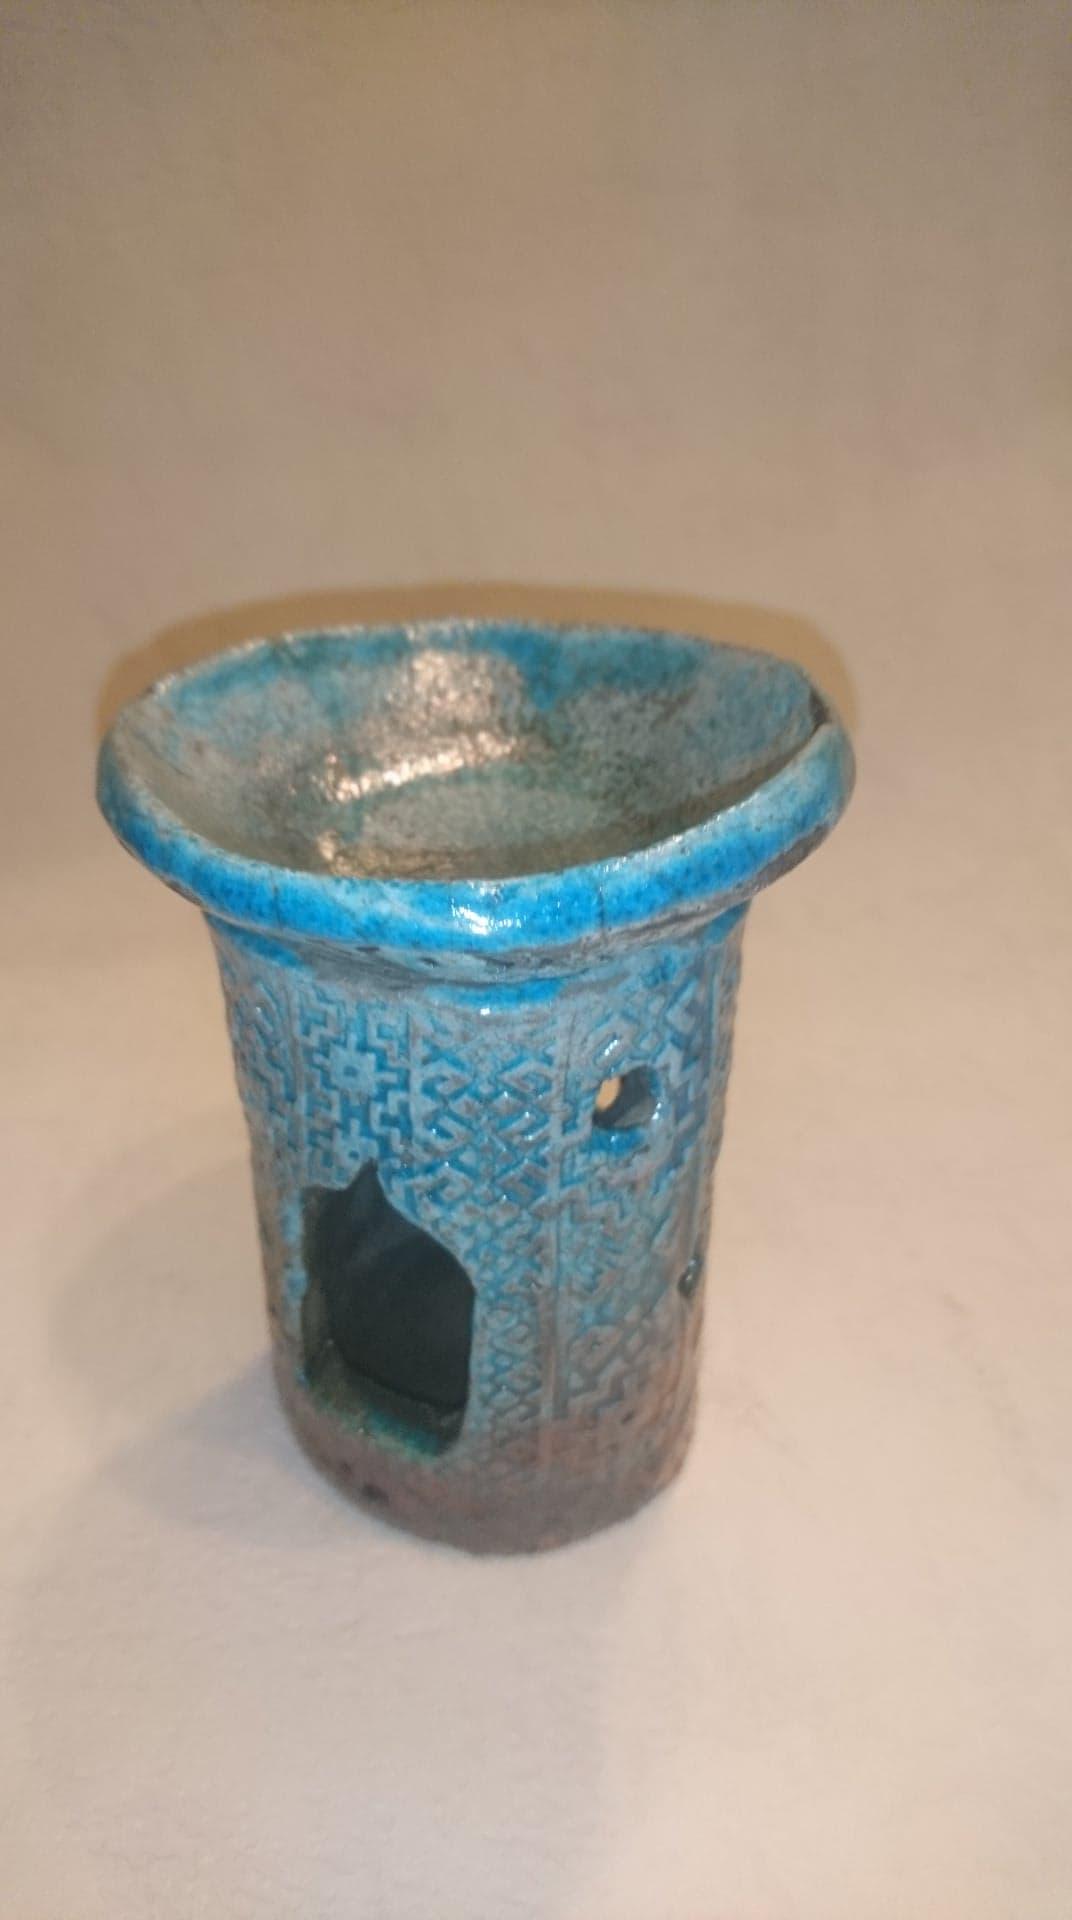 Diffuseur de parfums en céramique Raku tons bleus